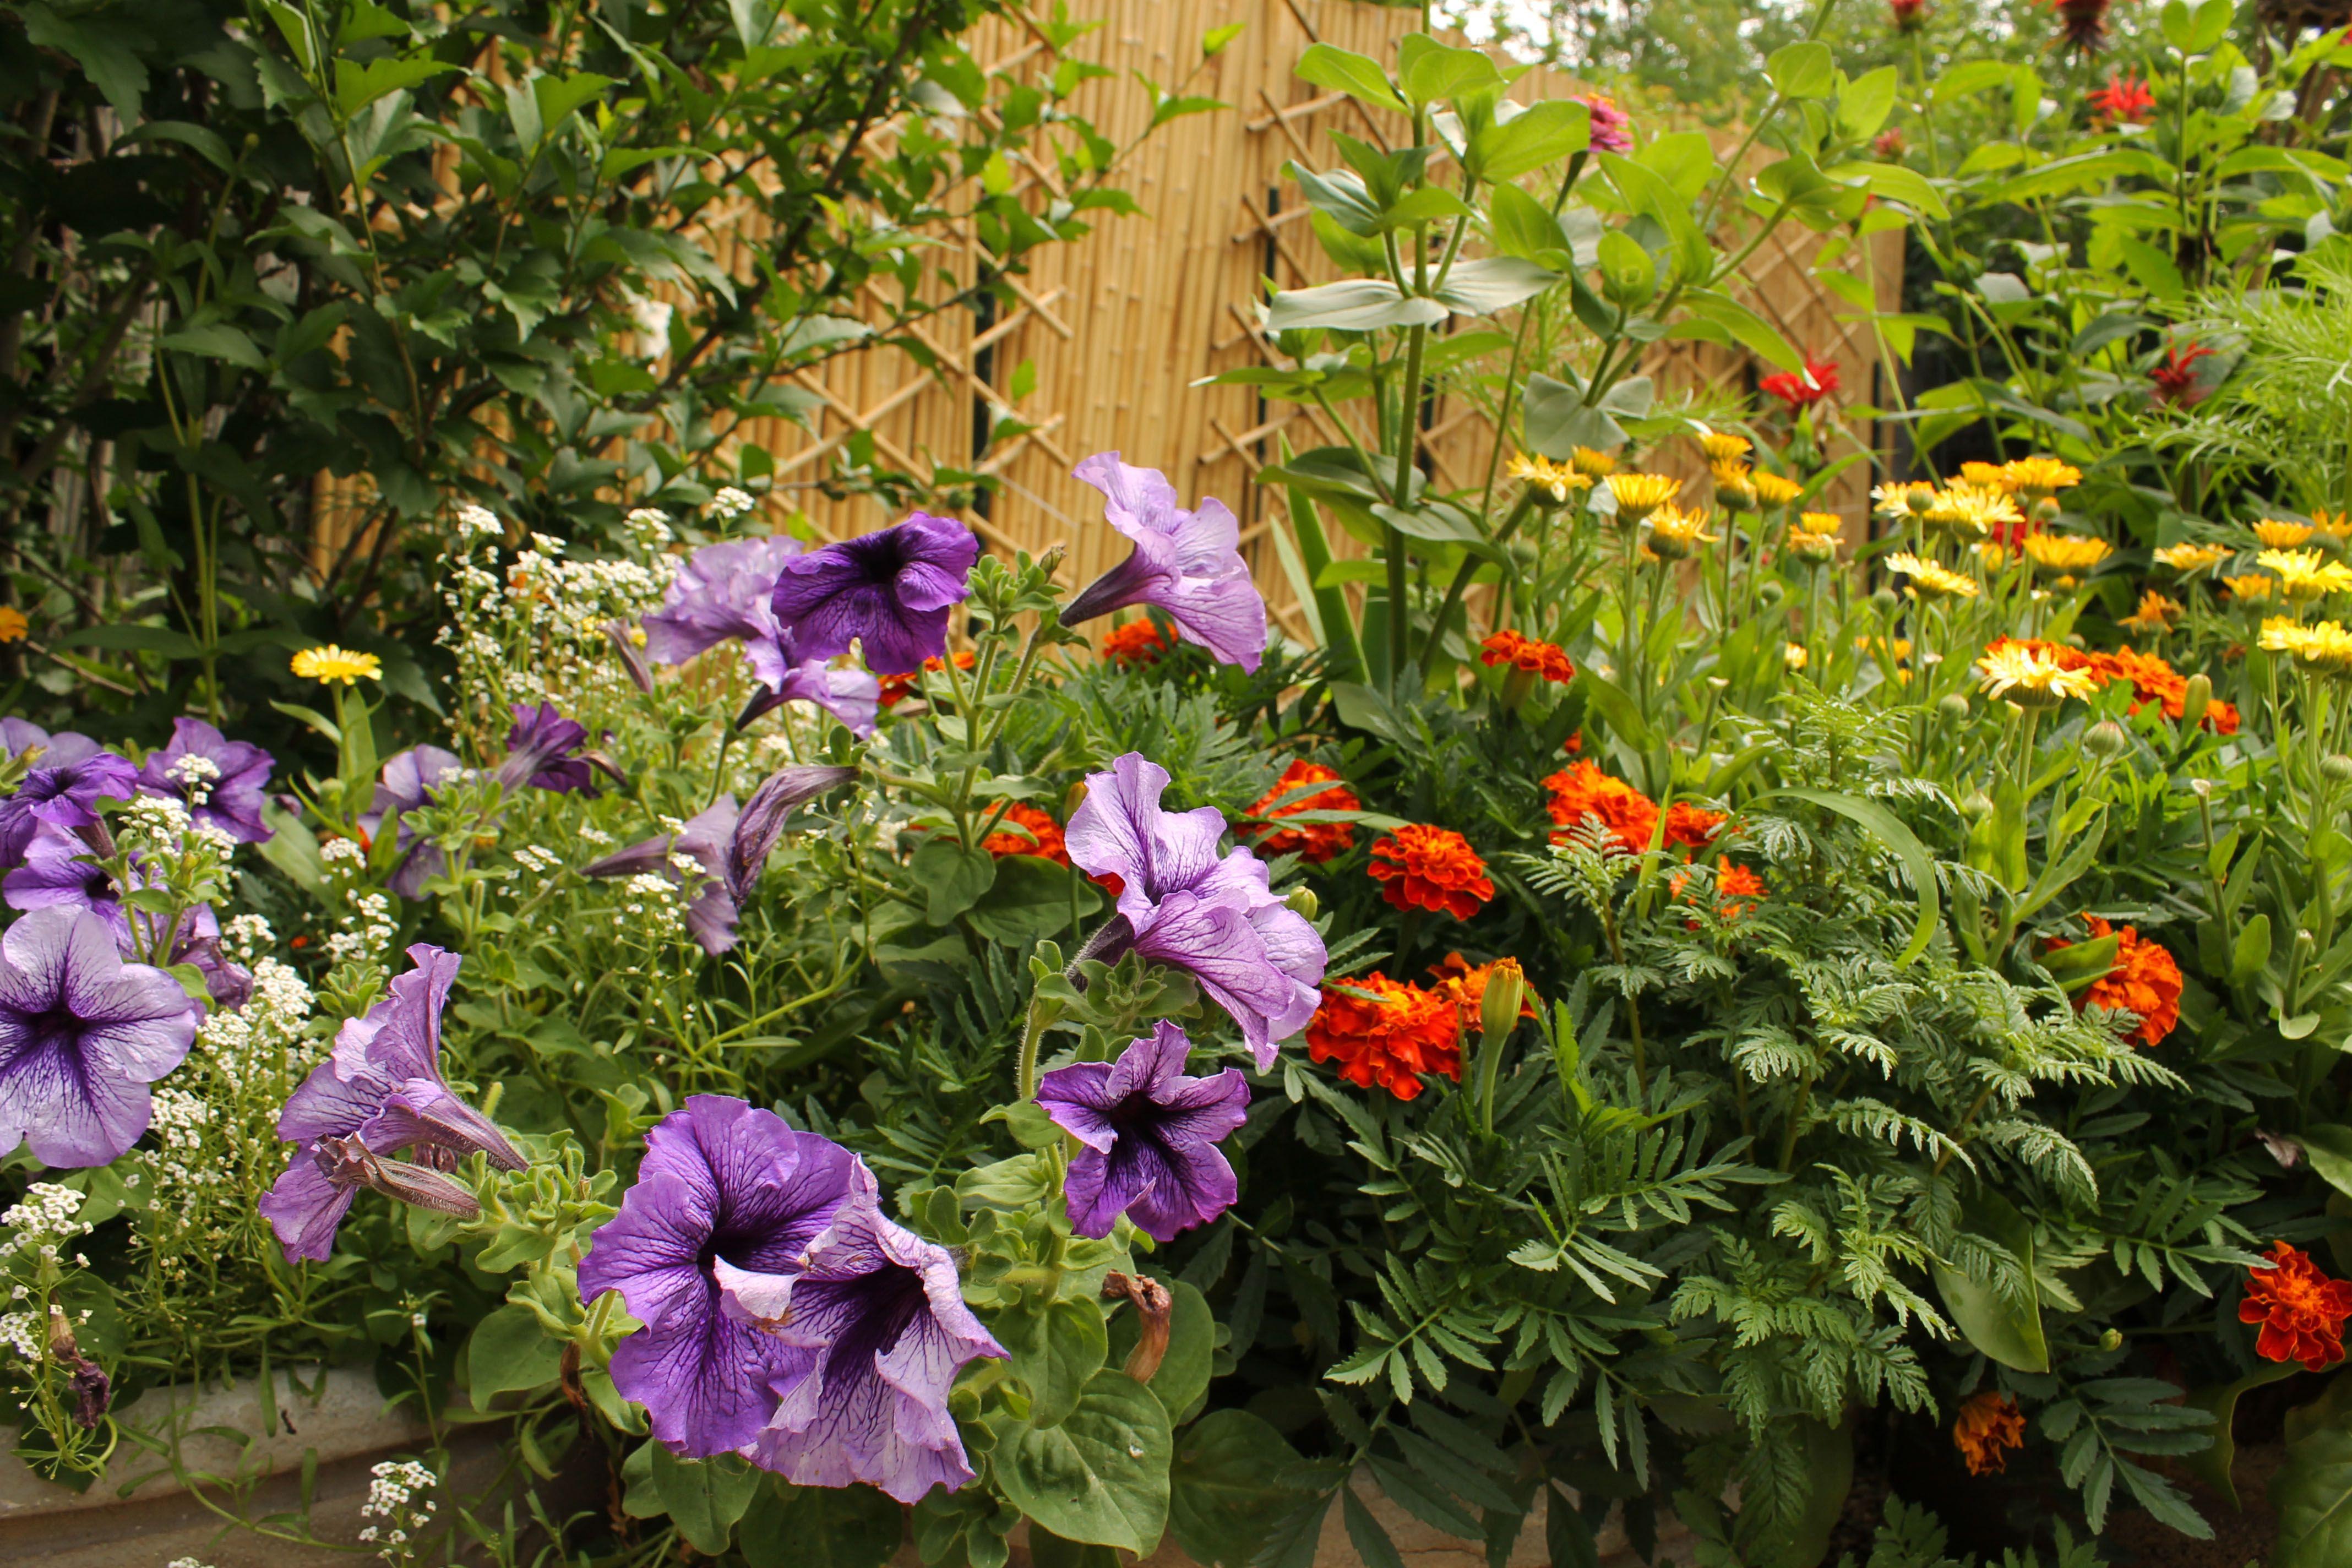 Petunias for pest control | Palm Rae Urban Potager | DESERT PLANTS ...